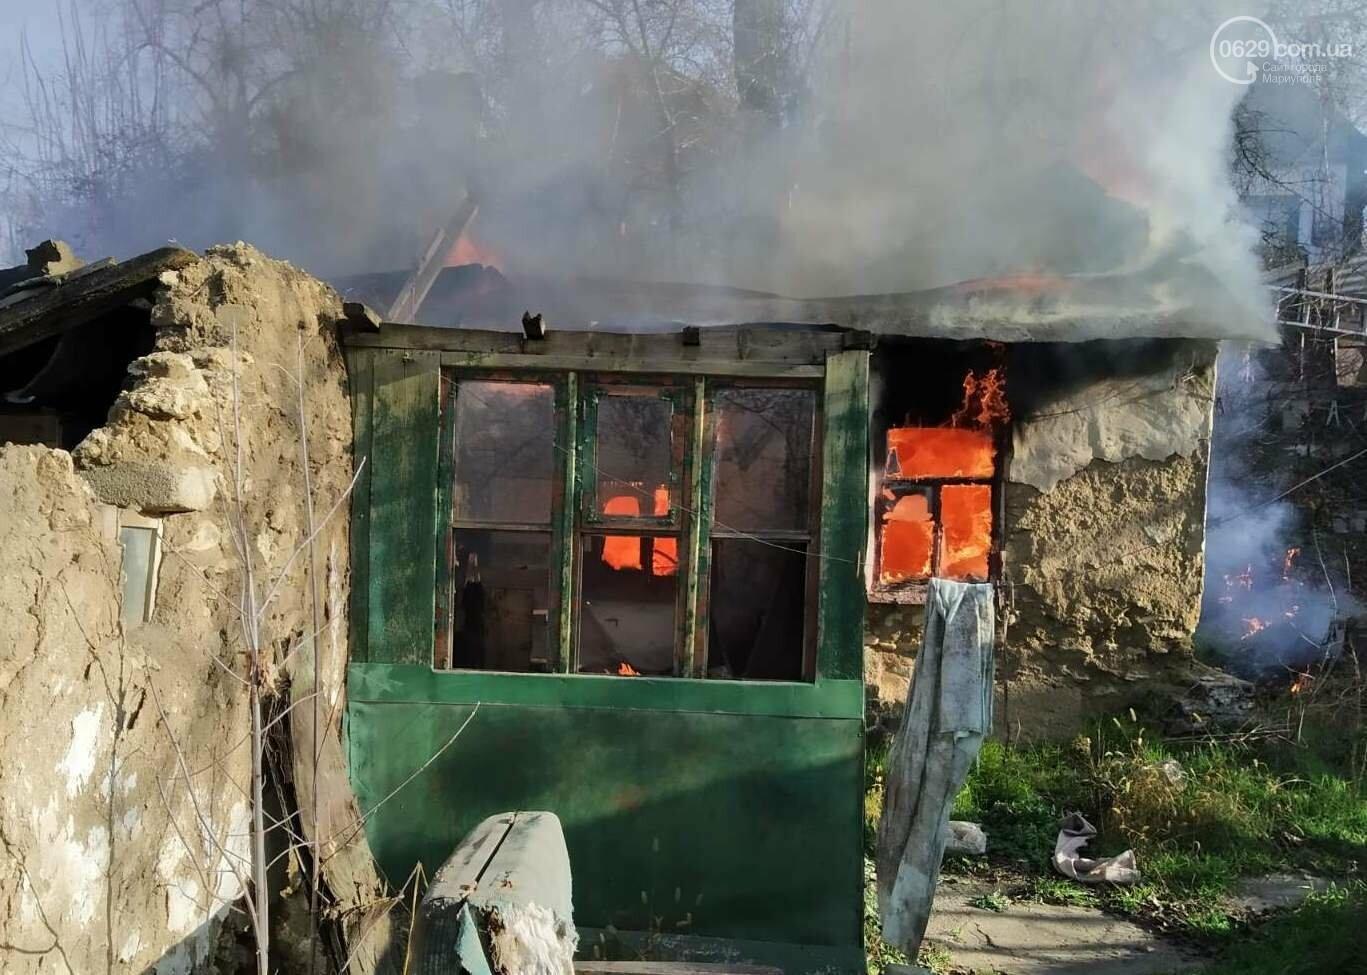 Мариуполец едва не погиб во время пожара,- ФОТО, фото-4